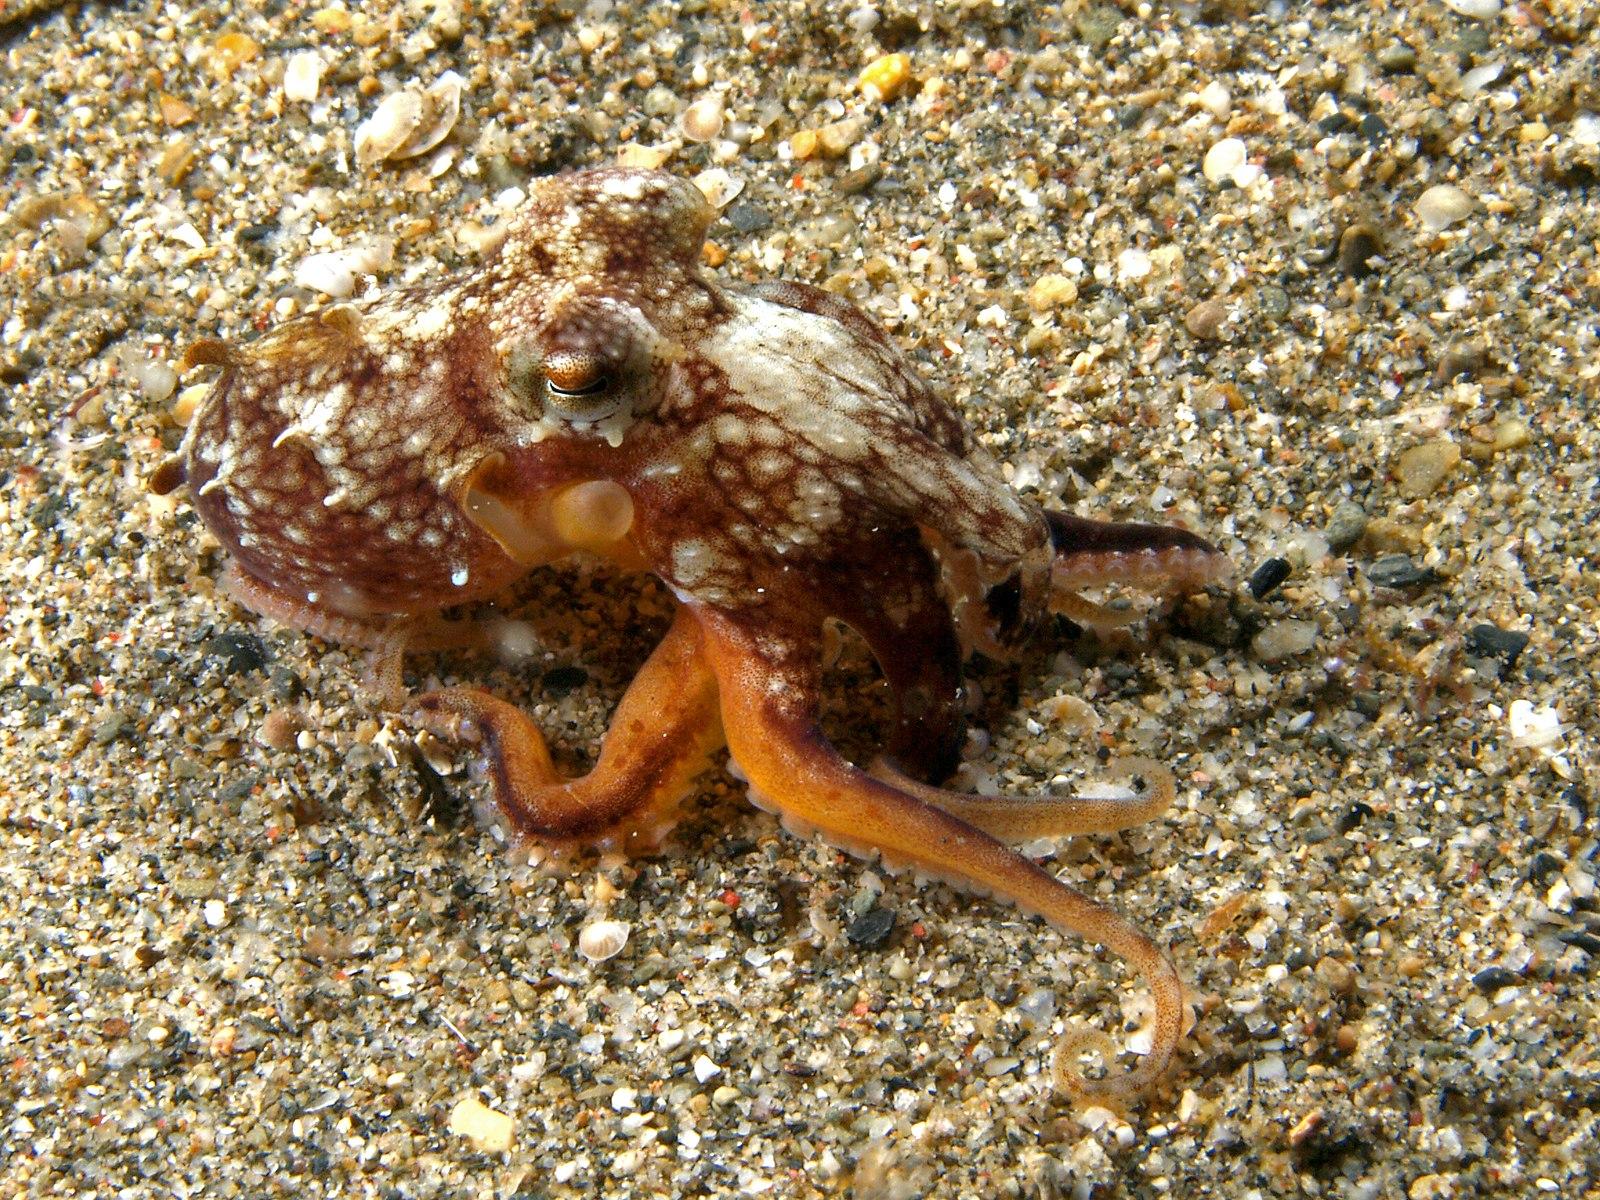 The bionic walking octopus